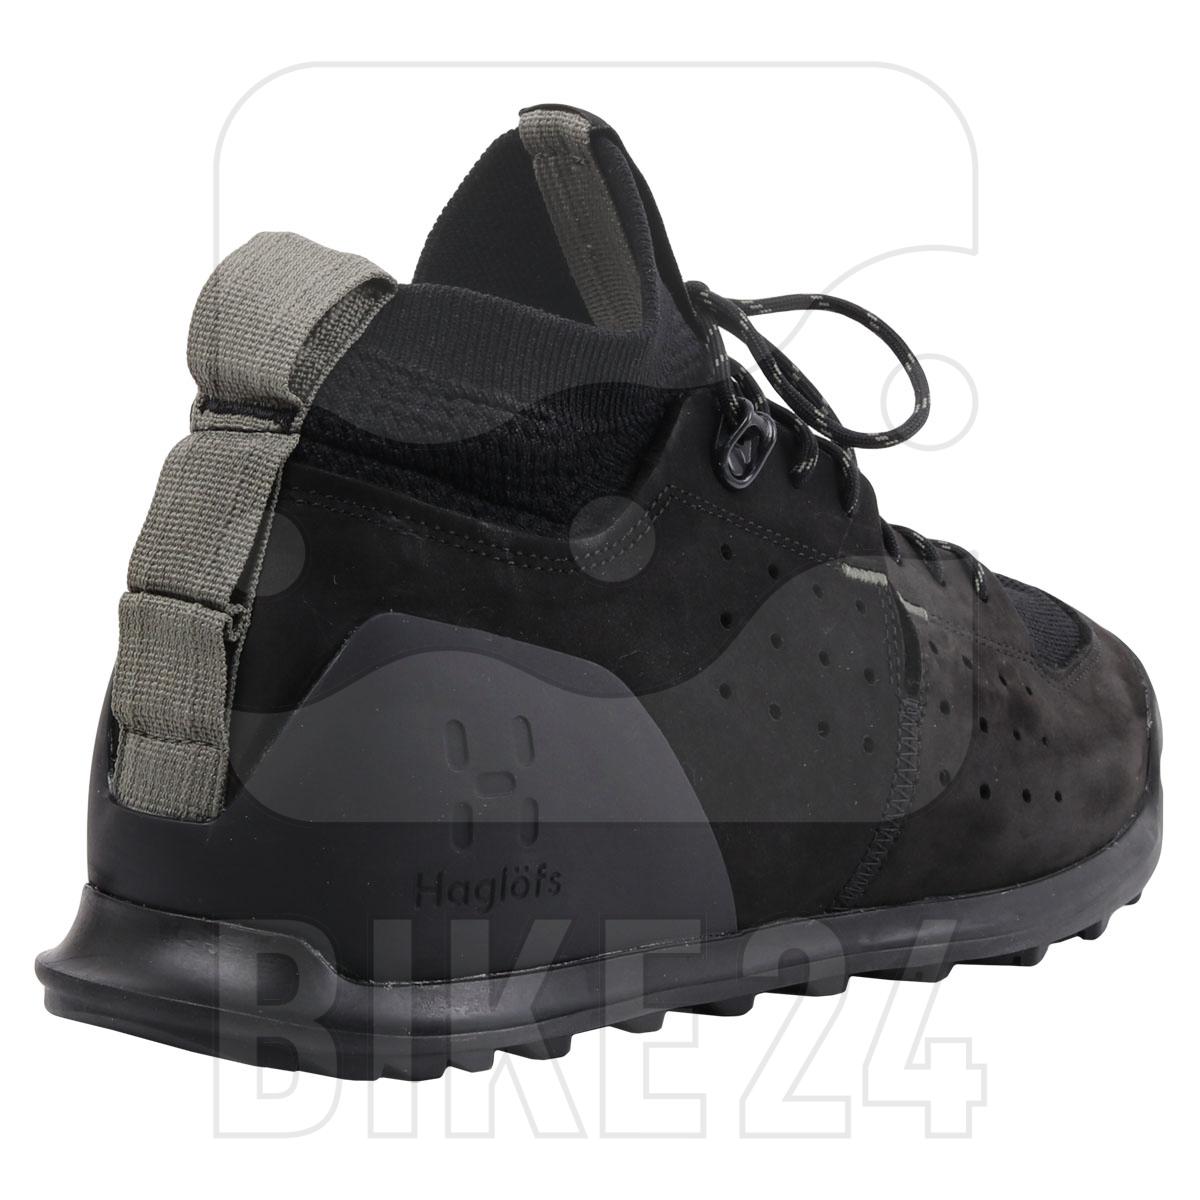 Image of Haglöfs Duality AT2 Men Hiking Shoe - deep woods/true black 3NR